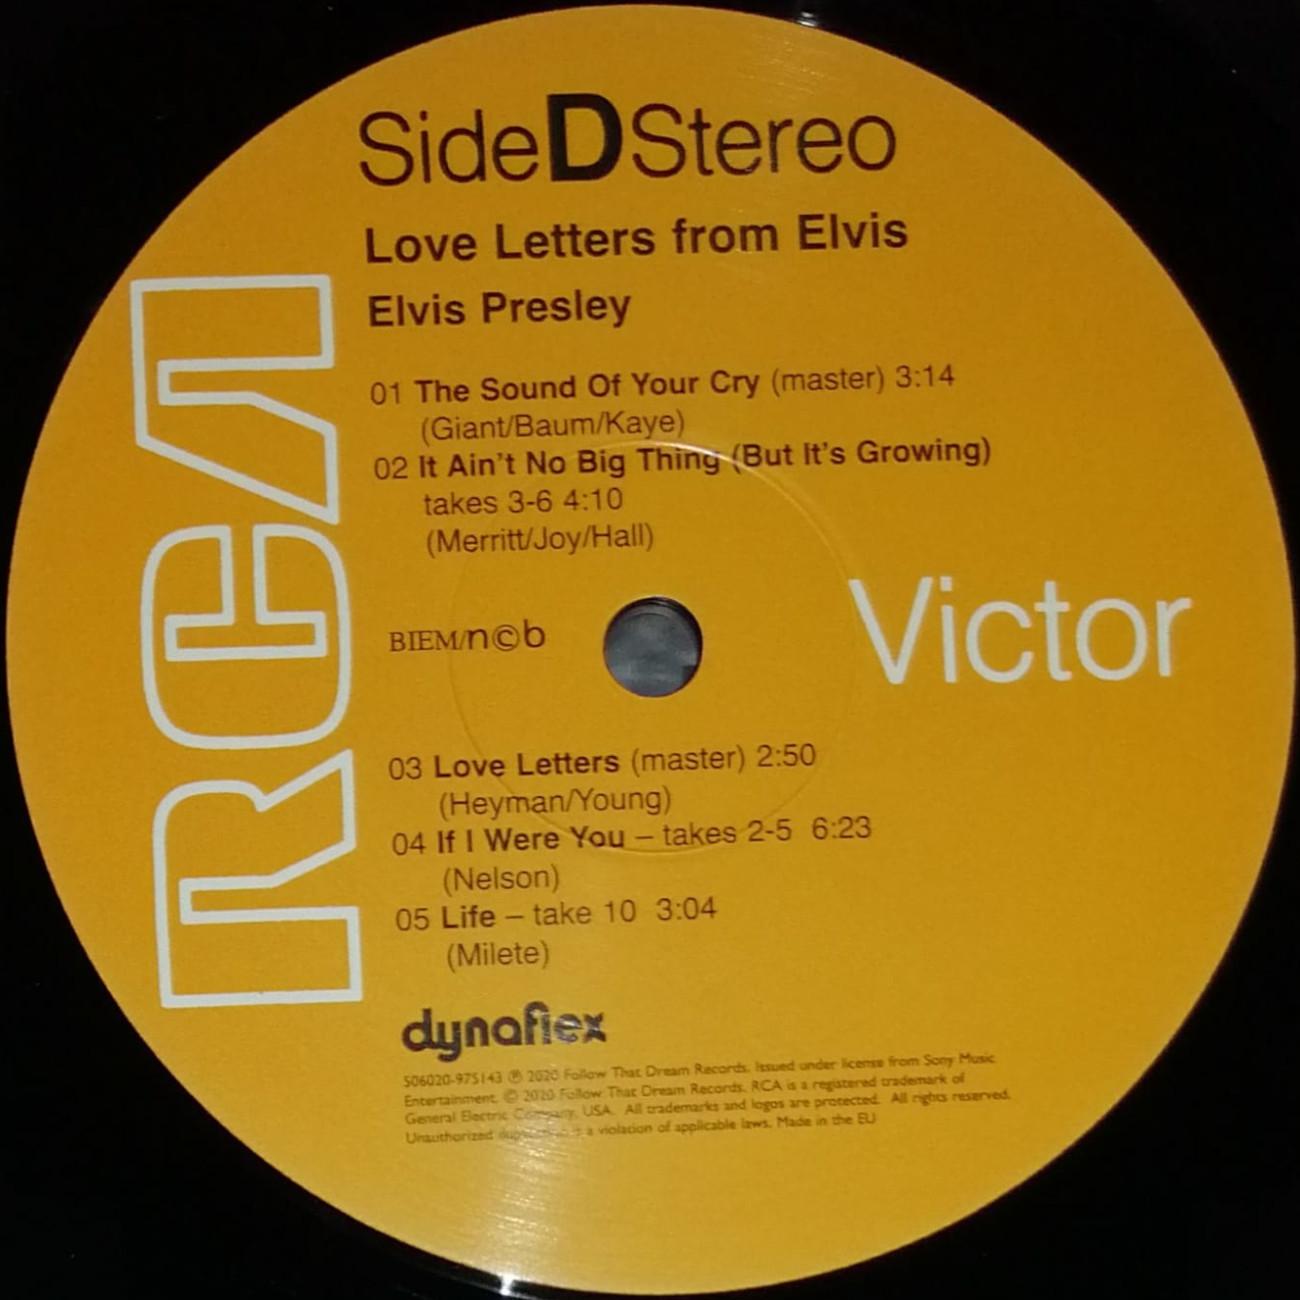 LOVE LETTERS FROM ELVIS 506020-9751439k7jsg